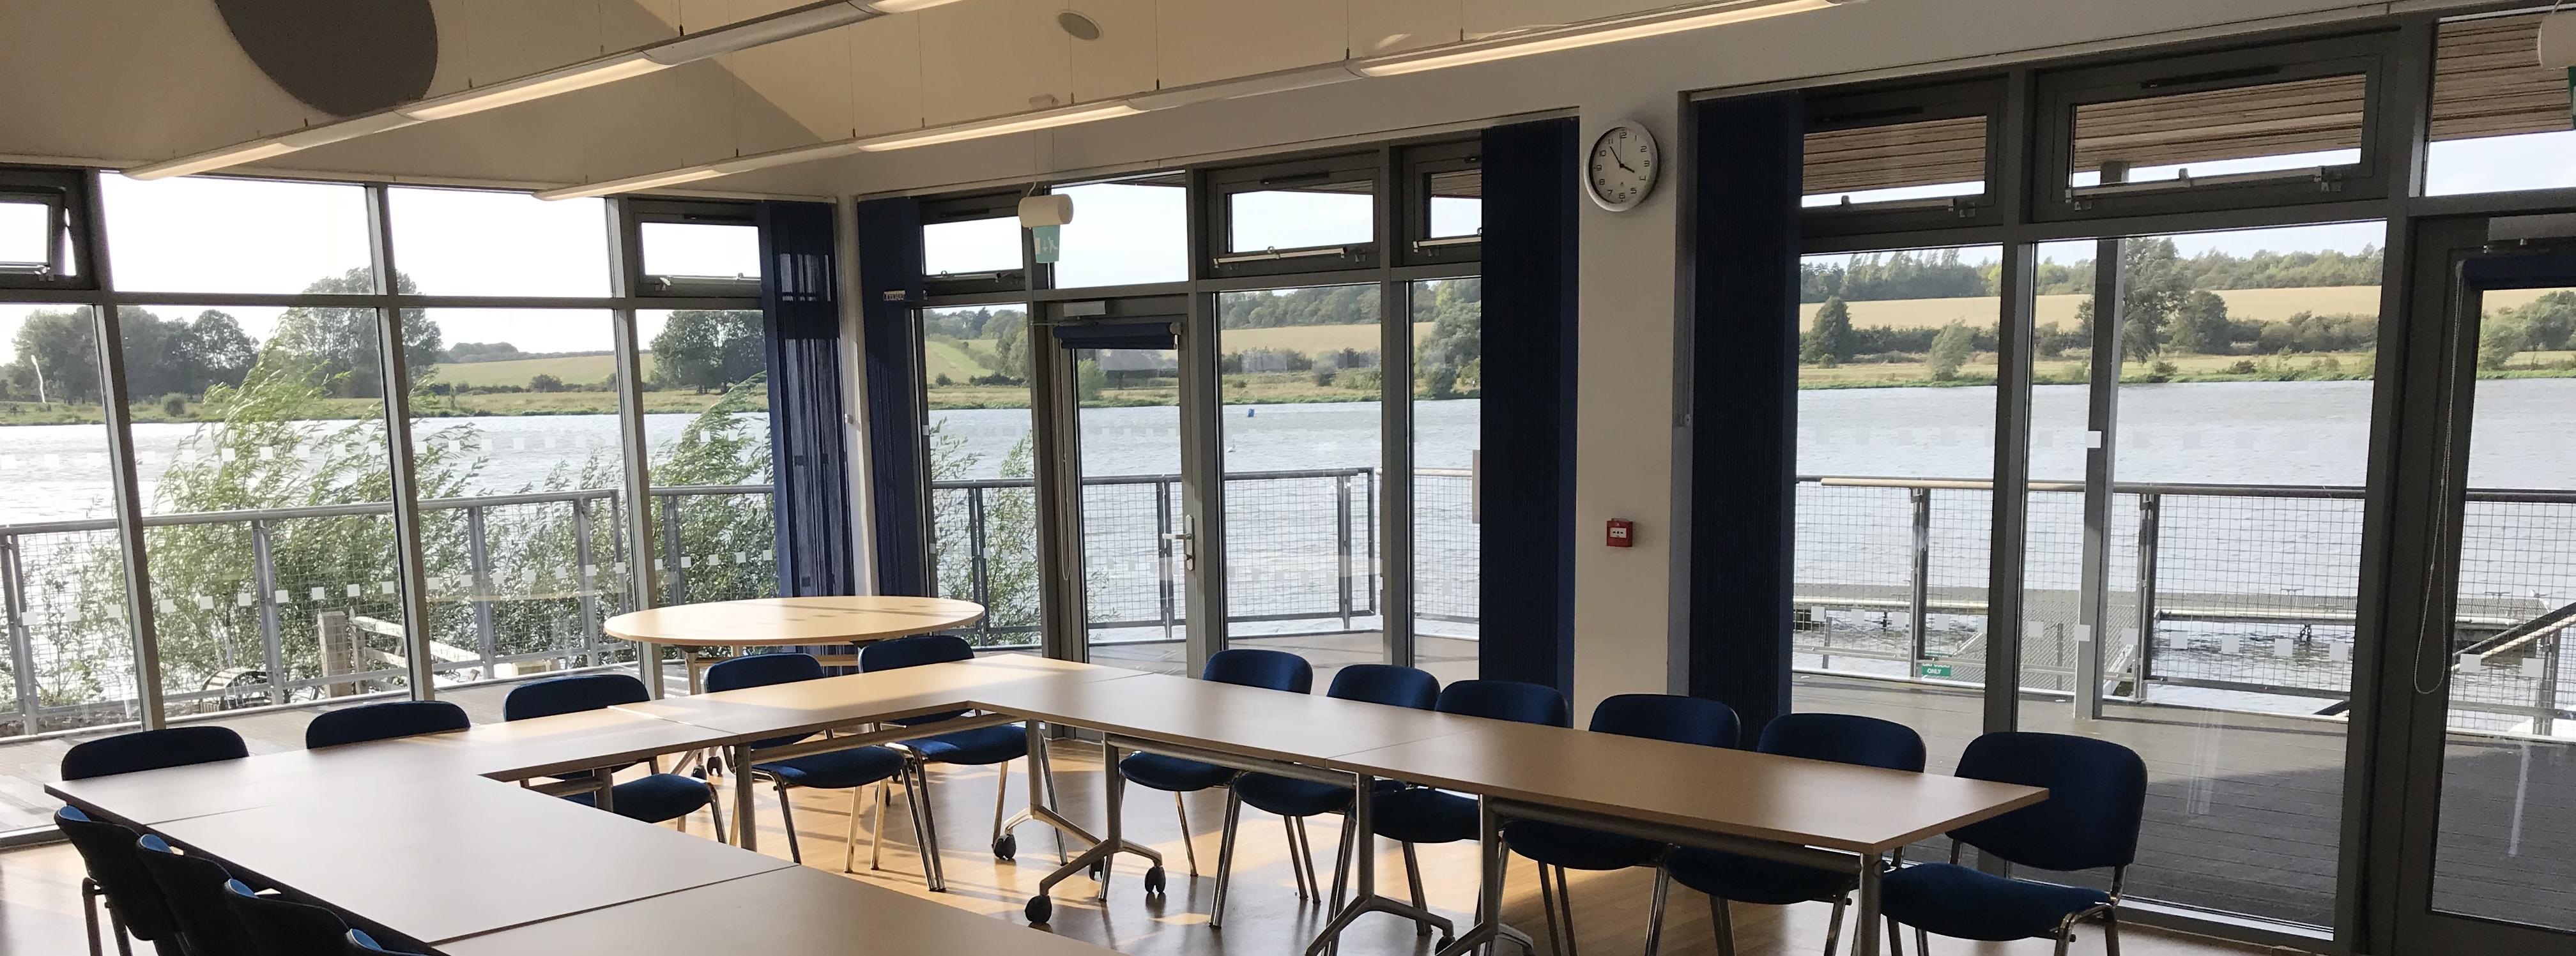 Nene Park offers 10% off Lakeside Meeting Room bookings for Bondholder Members